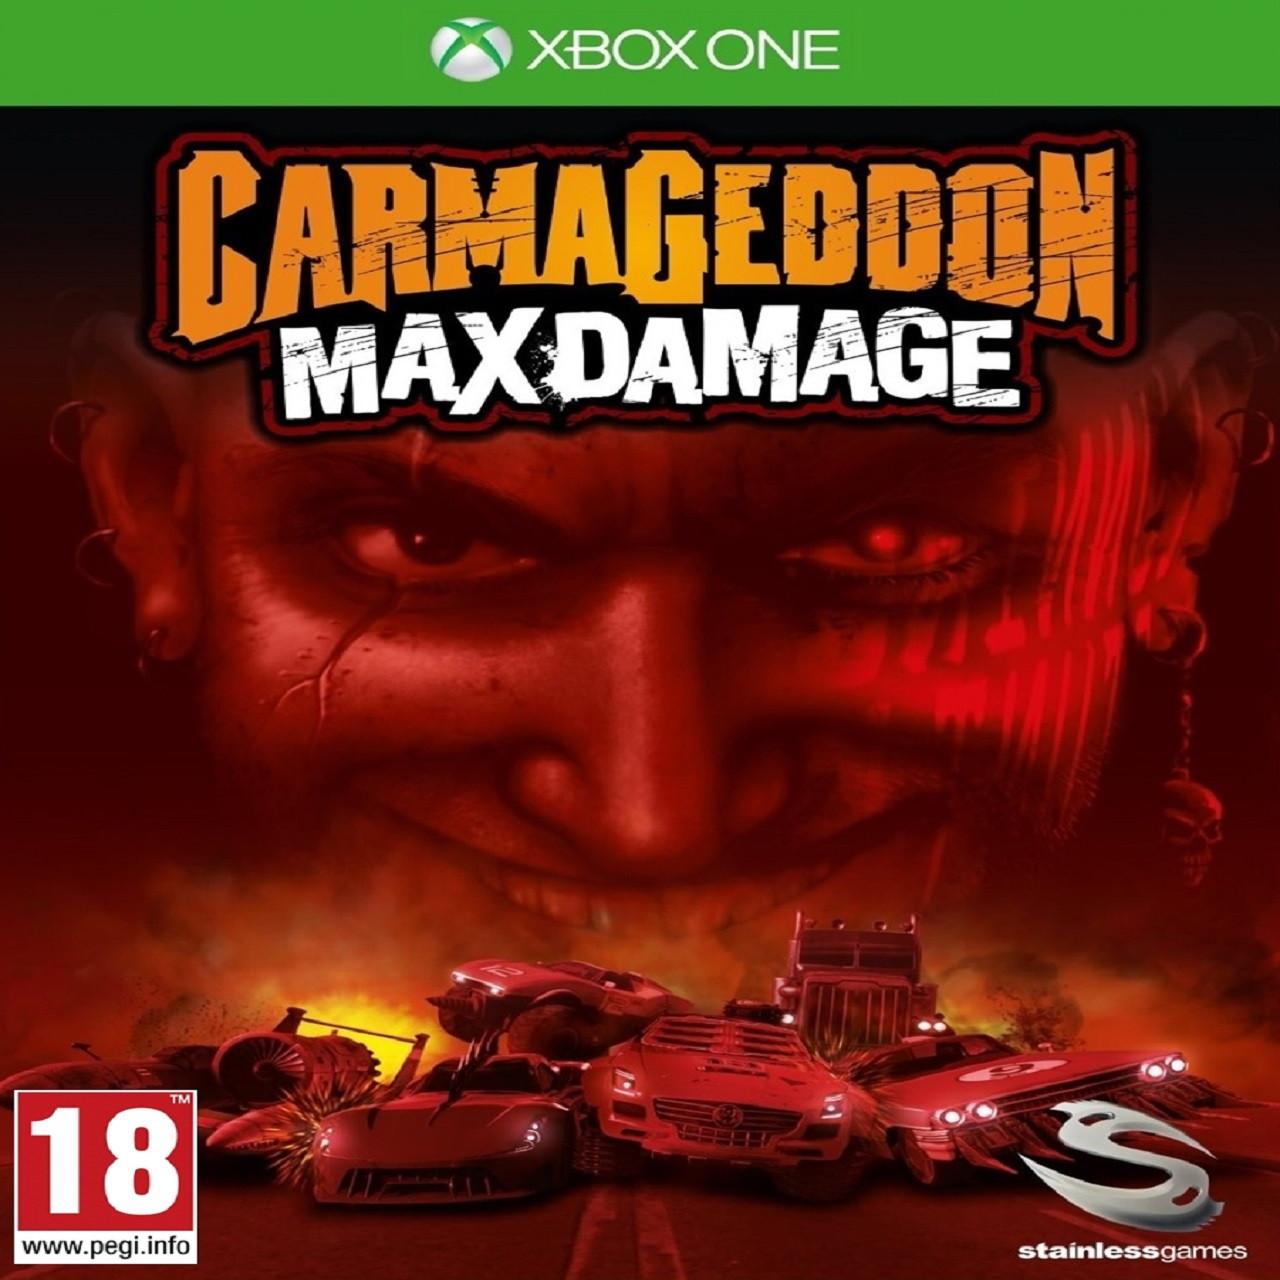 Carmageddon: Max Damage RUS XBOX ONE (NEW)